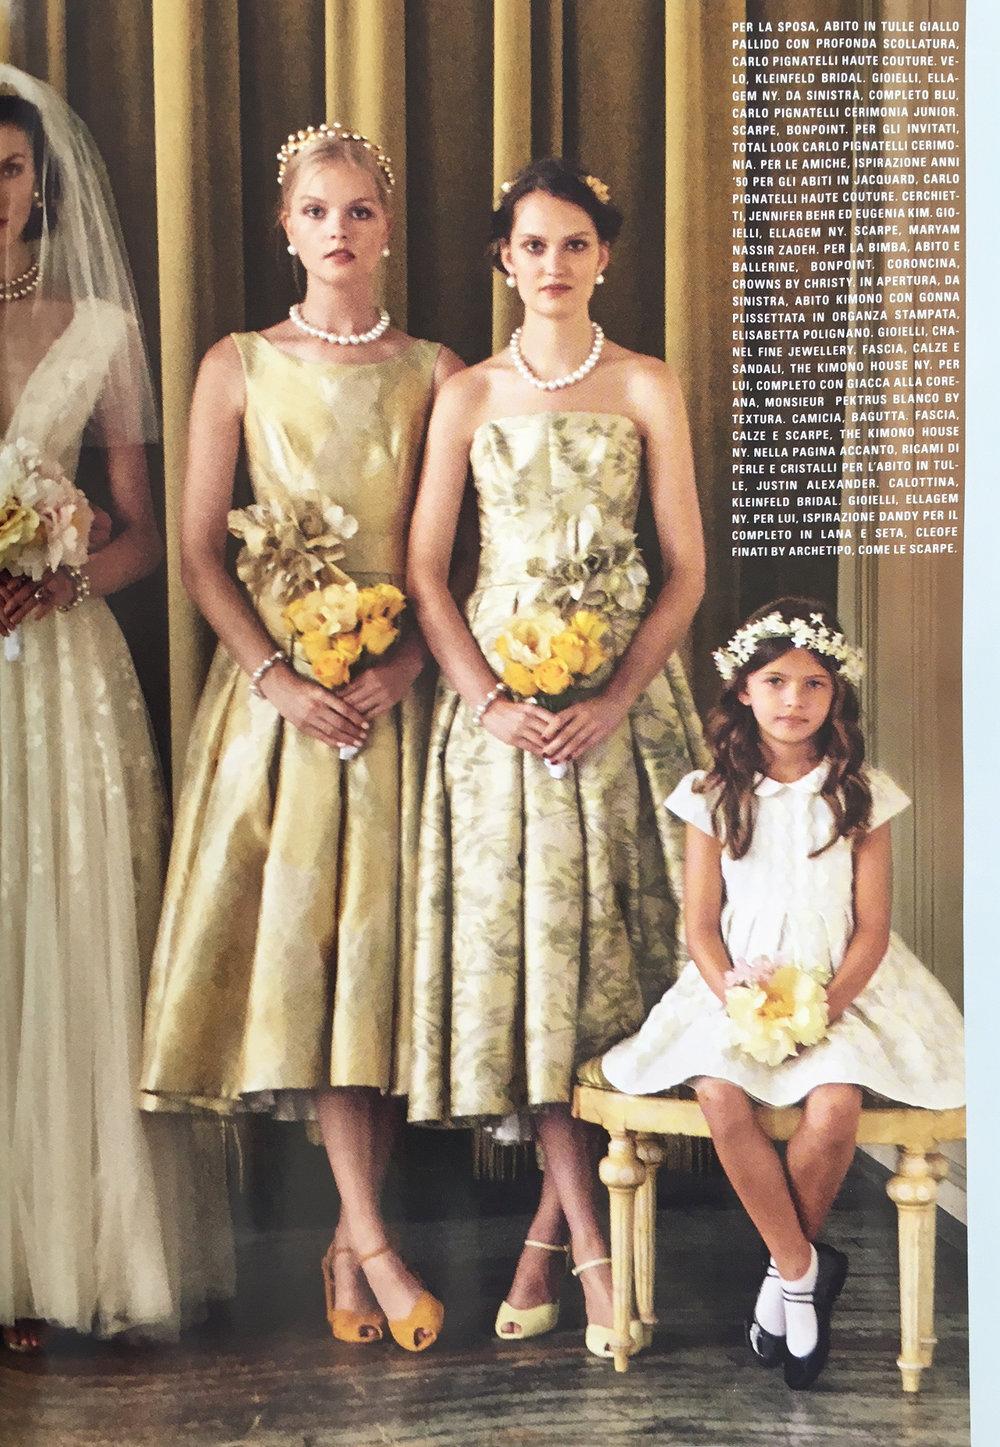 Vogue Sposa - September 2016 #2.jpg